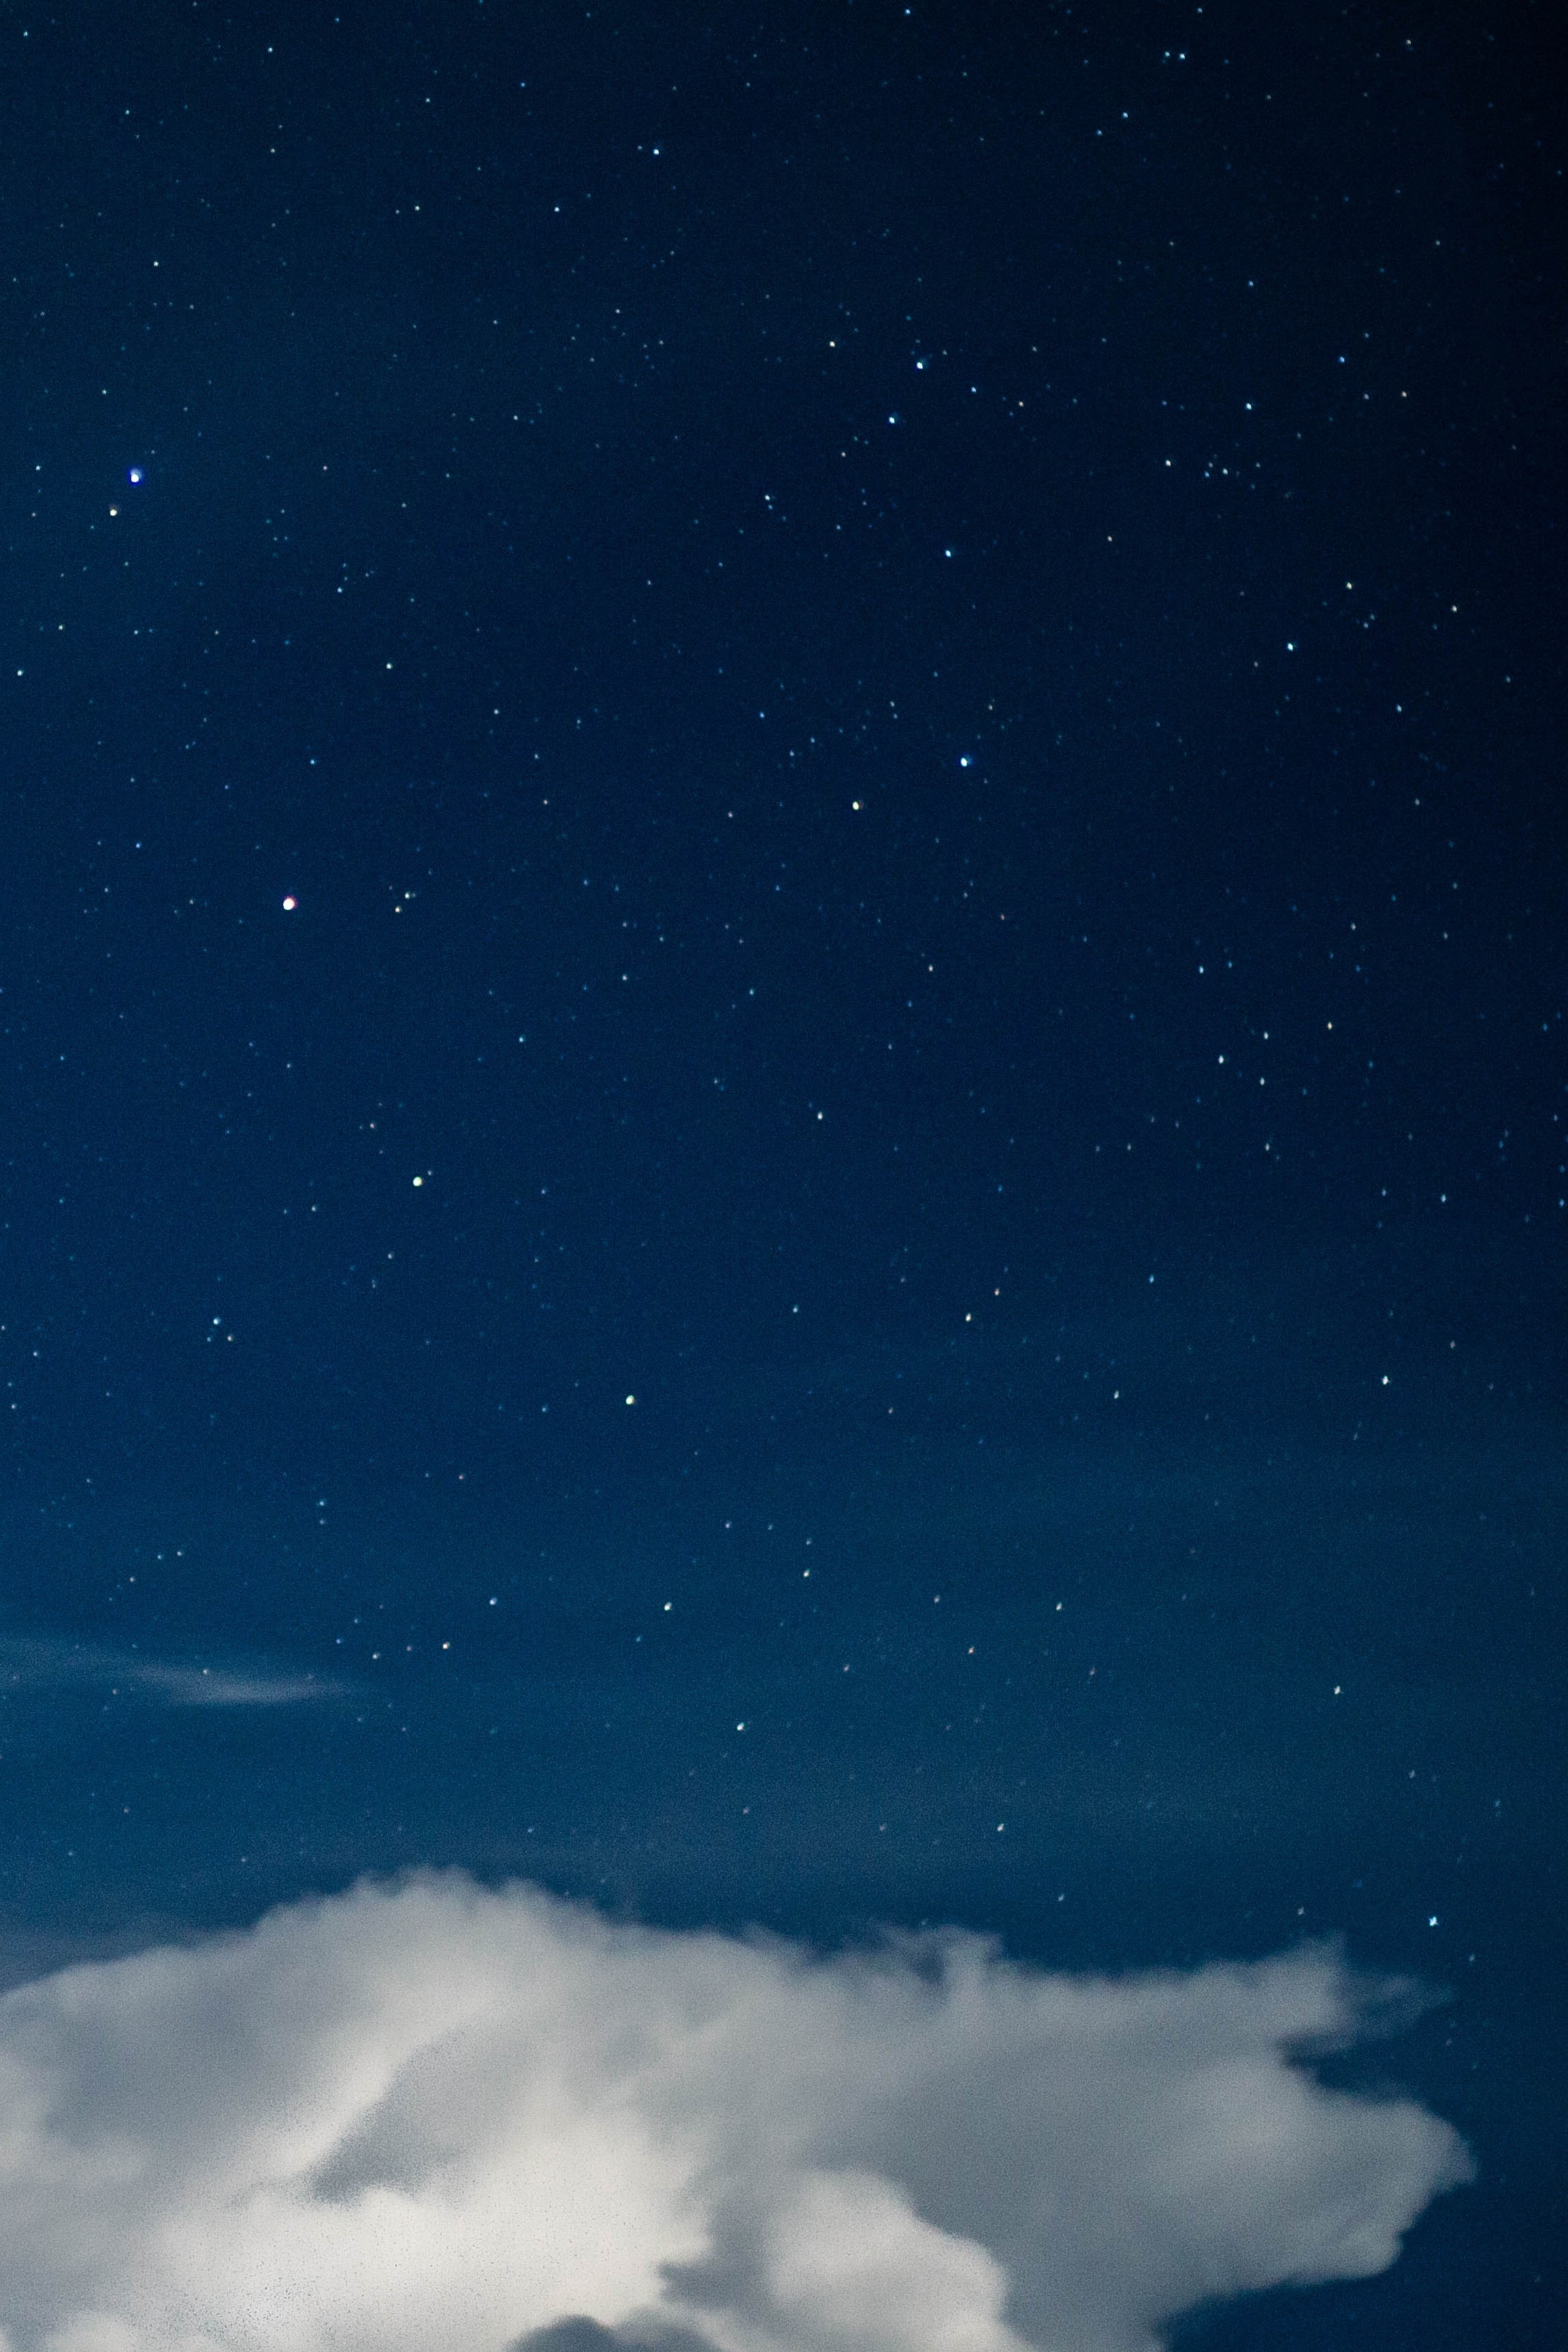 stars greg-jeanneau-9sxeKzuCVoE-unsplash.jpg